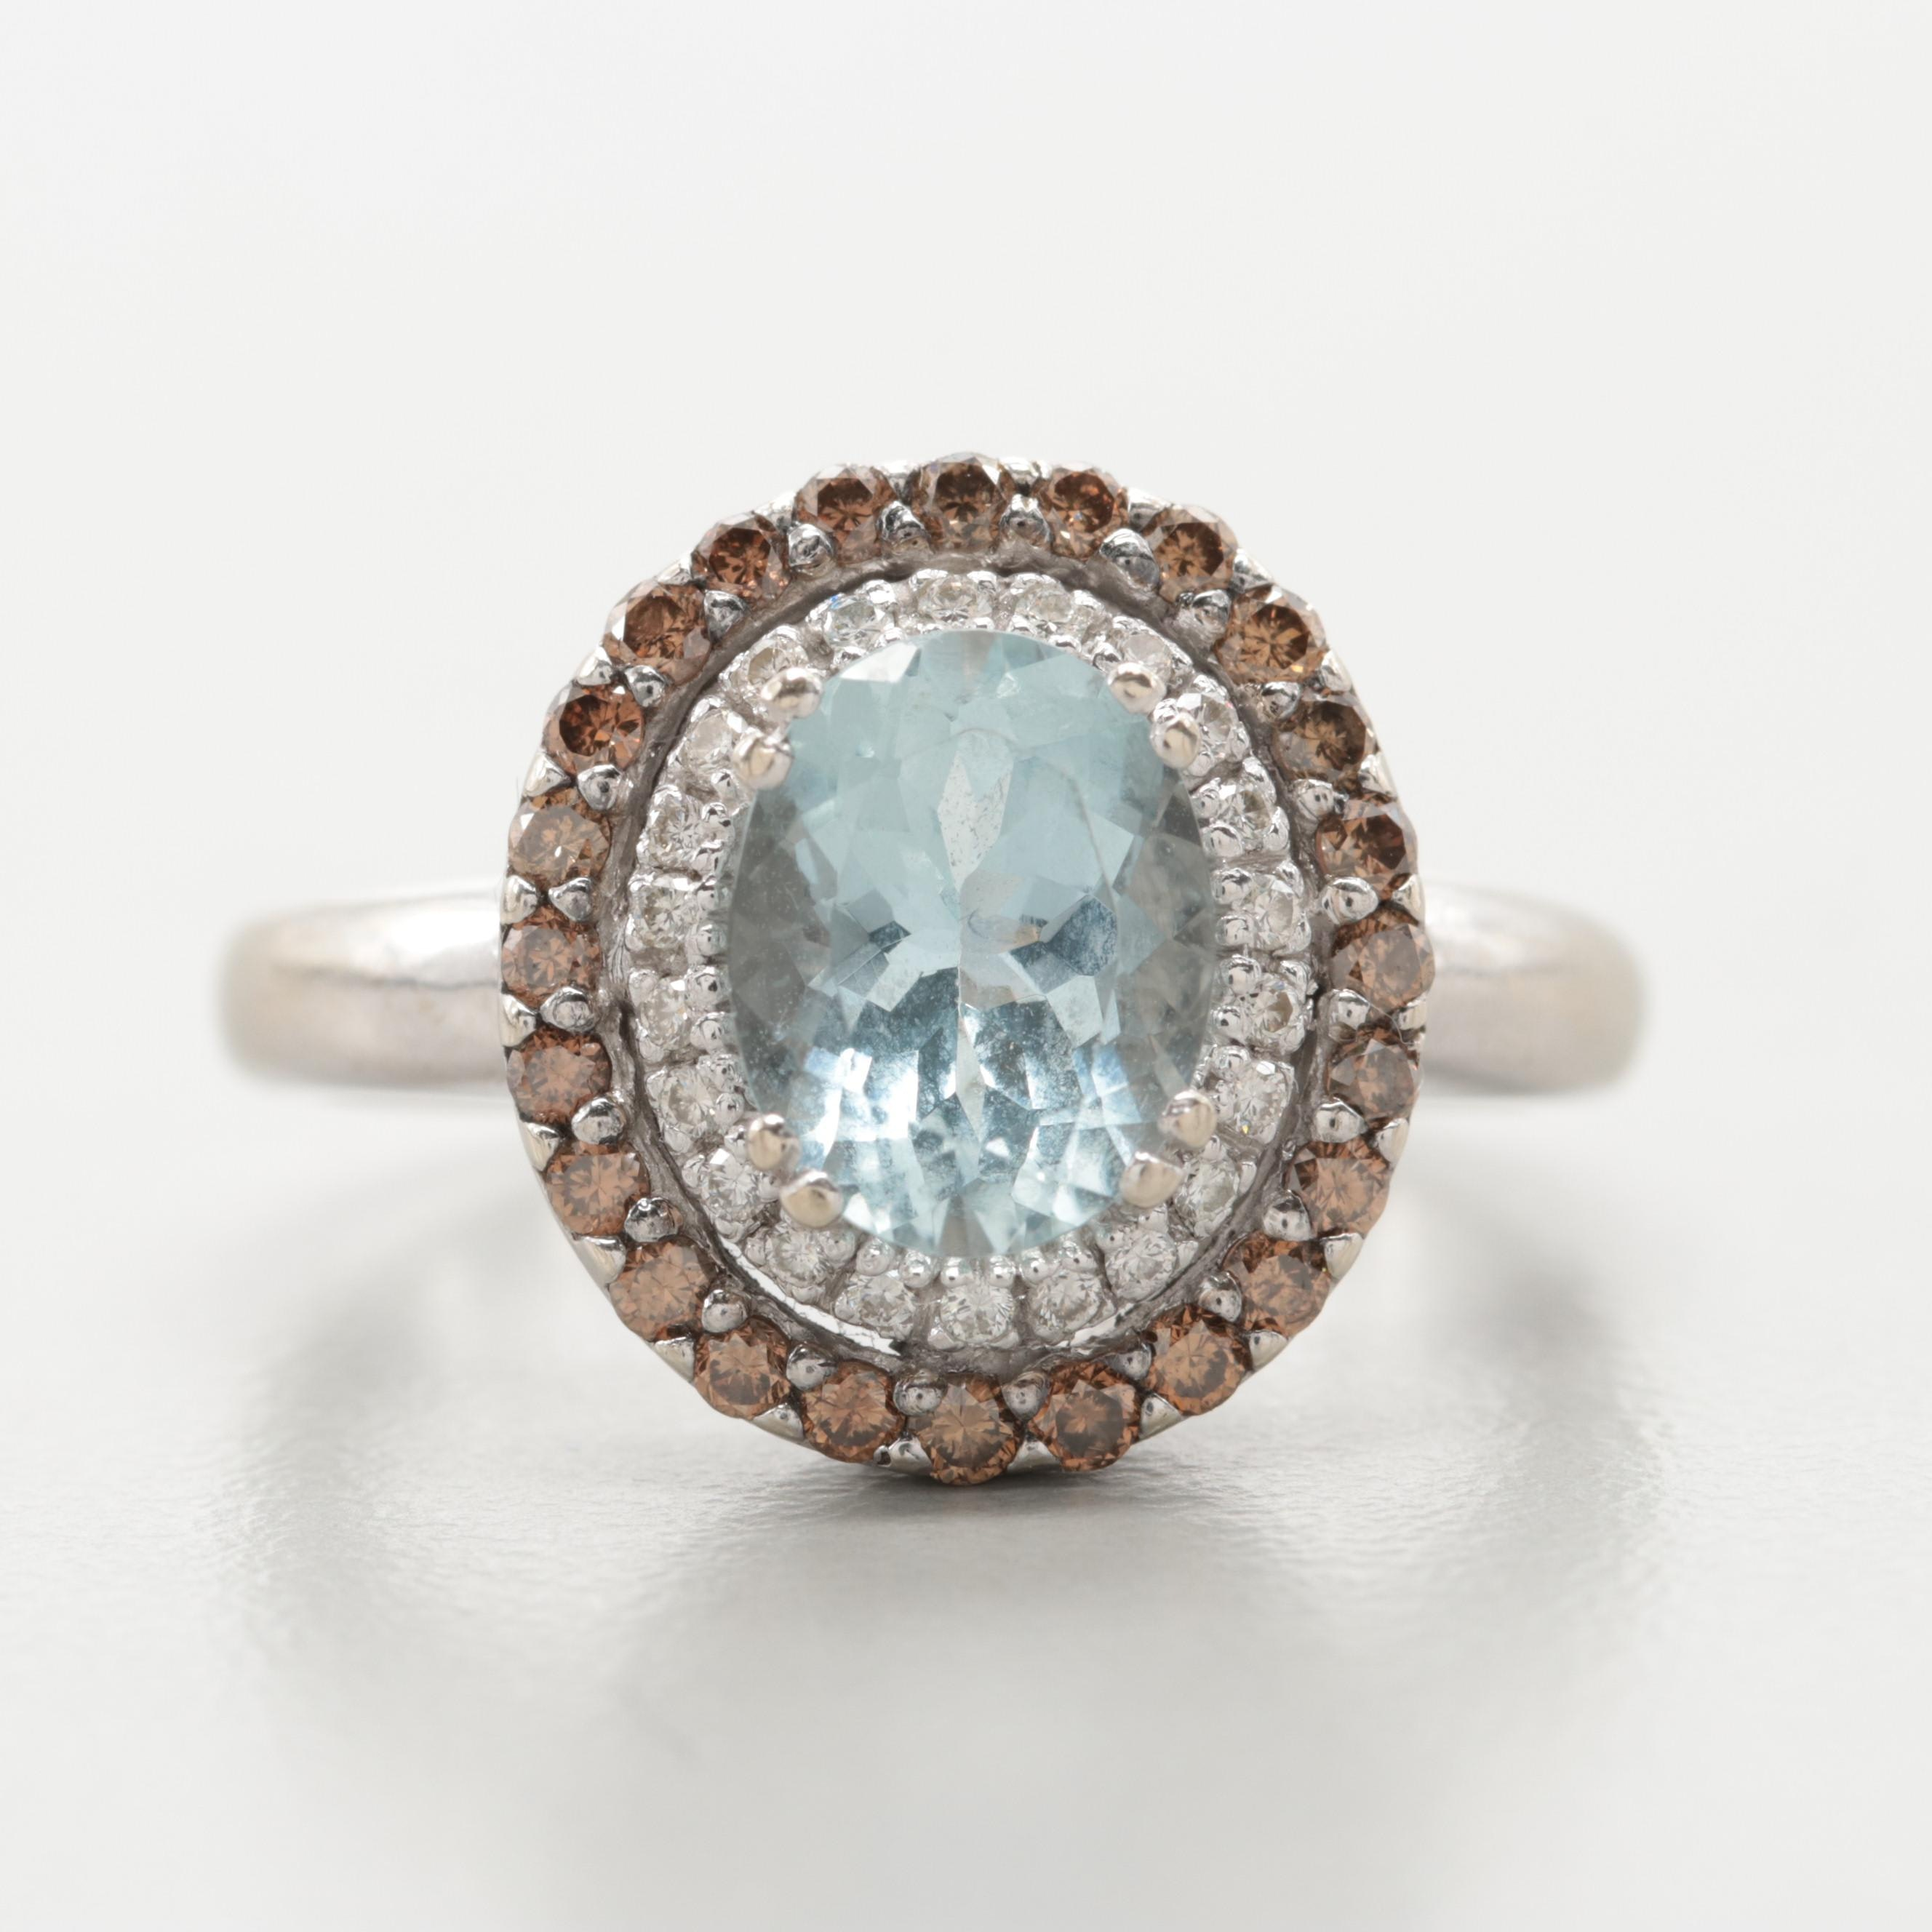 Le Vian 14K White Gold Aquamarine and Diamond Ring